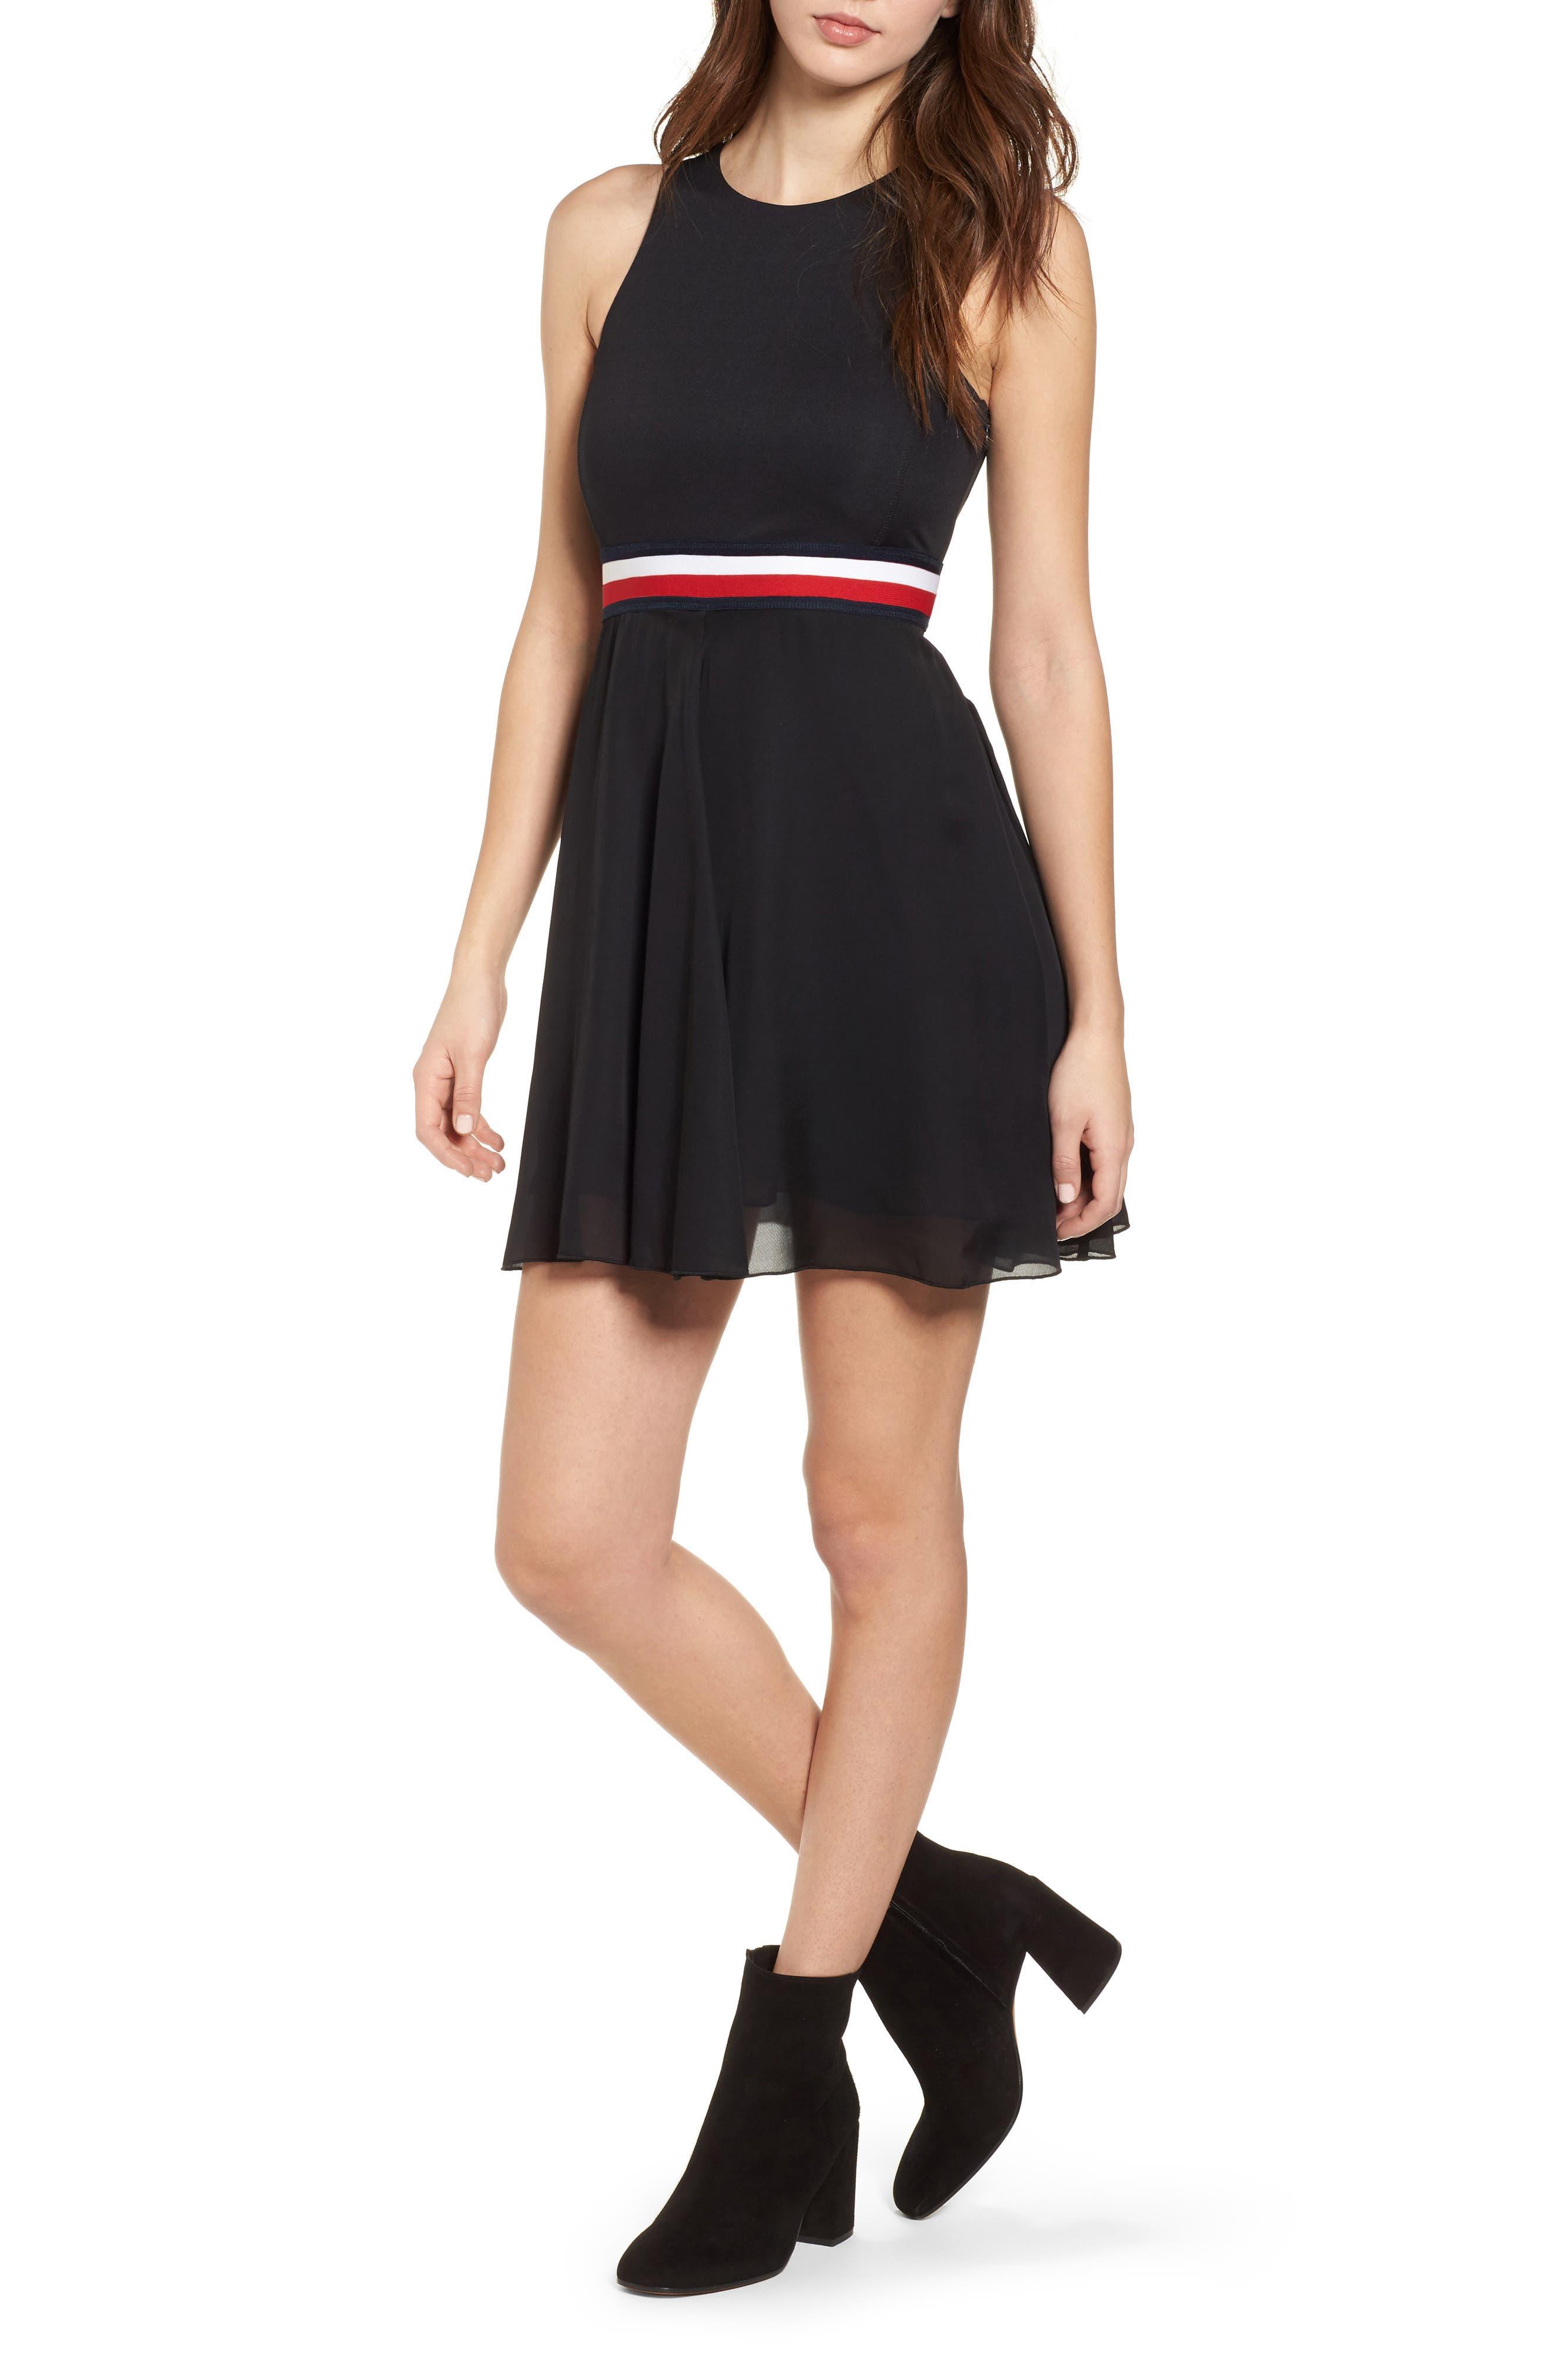 x Gigi Hadid Racerback Dress,                         Main,                         color, Black Beauty